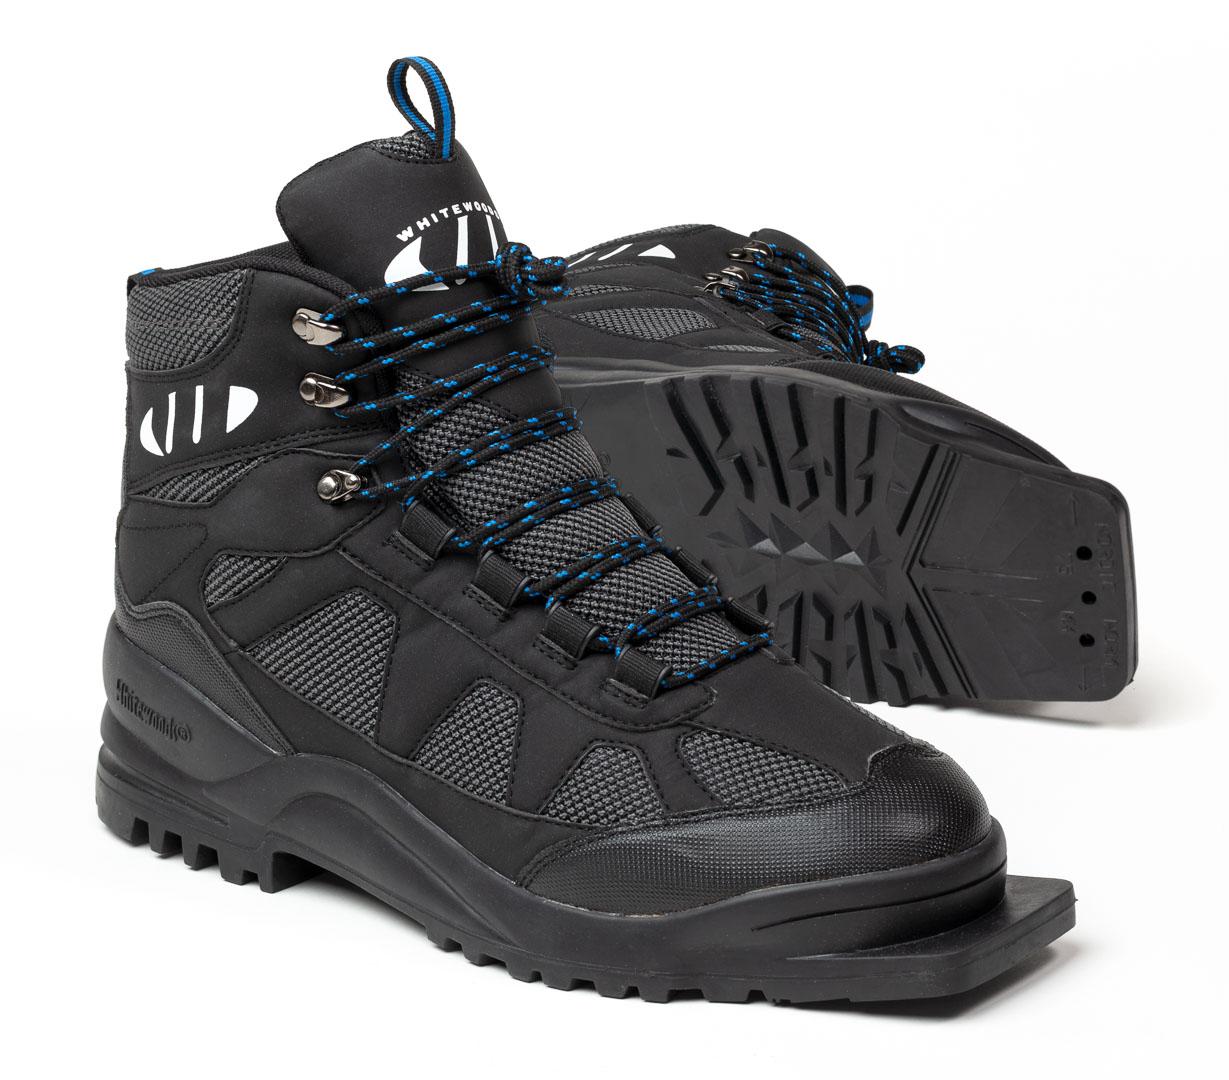 Whitewoods 301 75mm Ski Boots